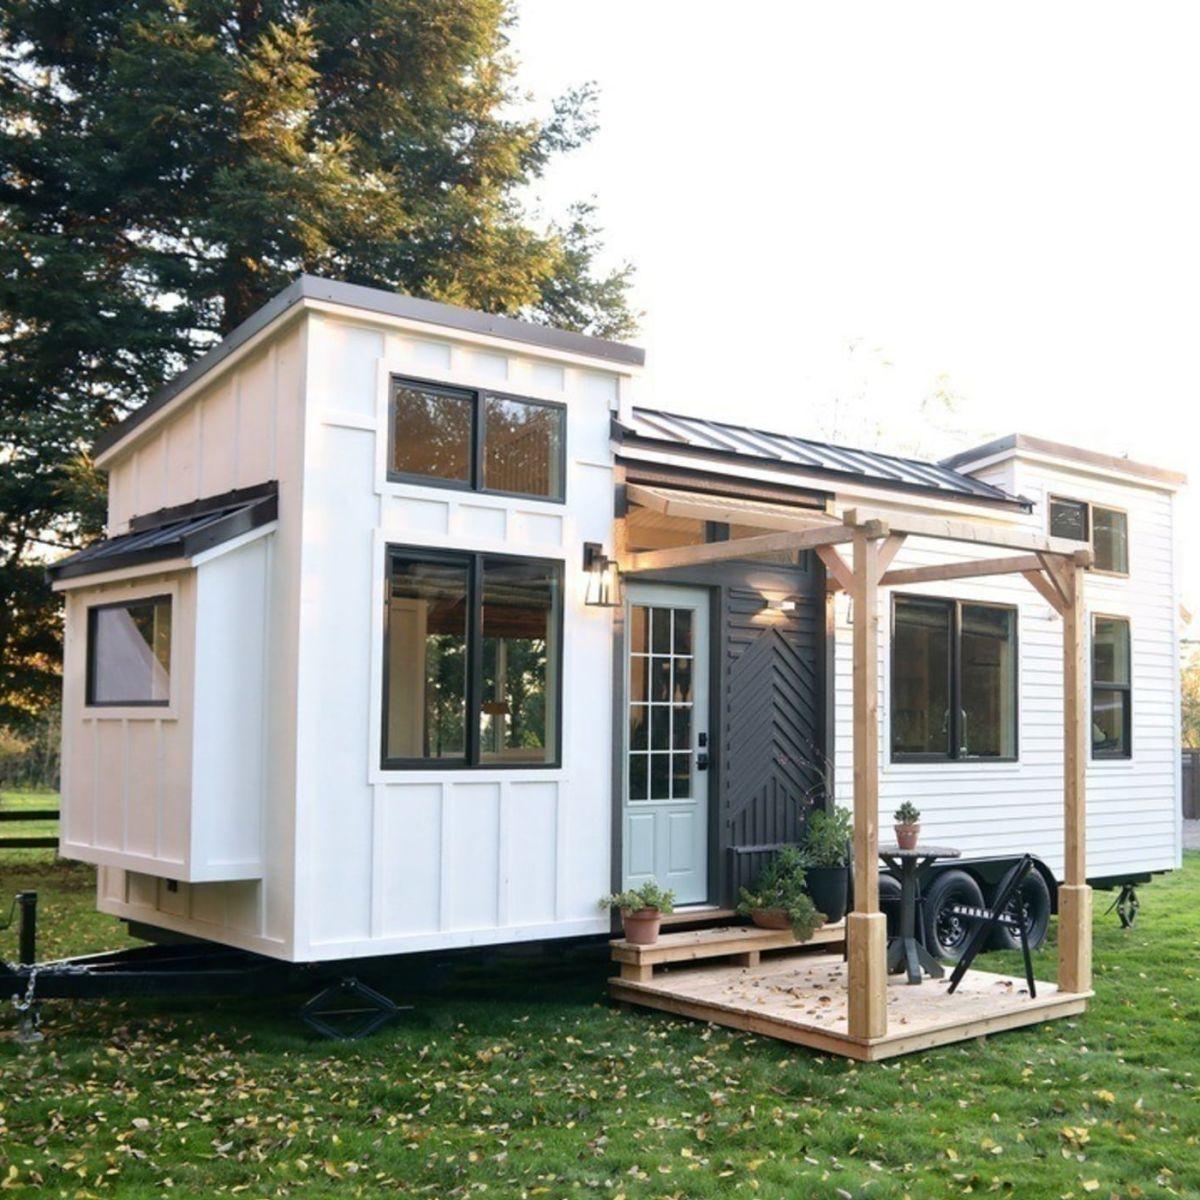 Home Design Smallhouse: Tiny House For Sale In Portland, Oregon